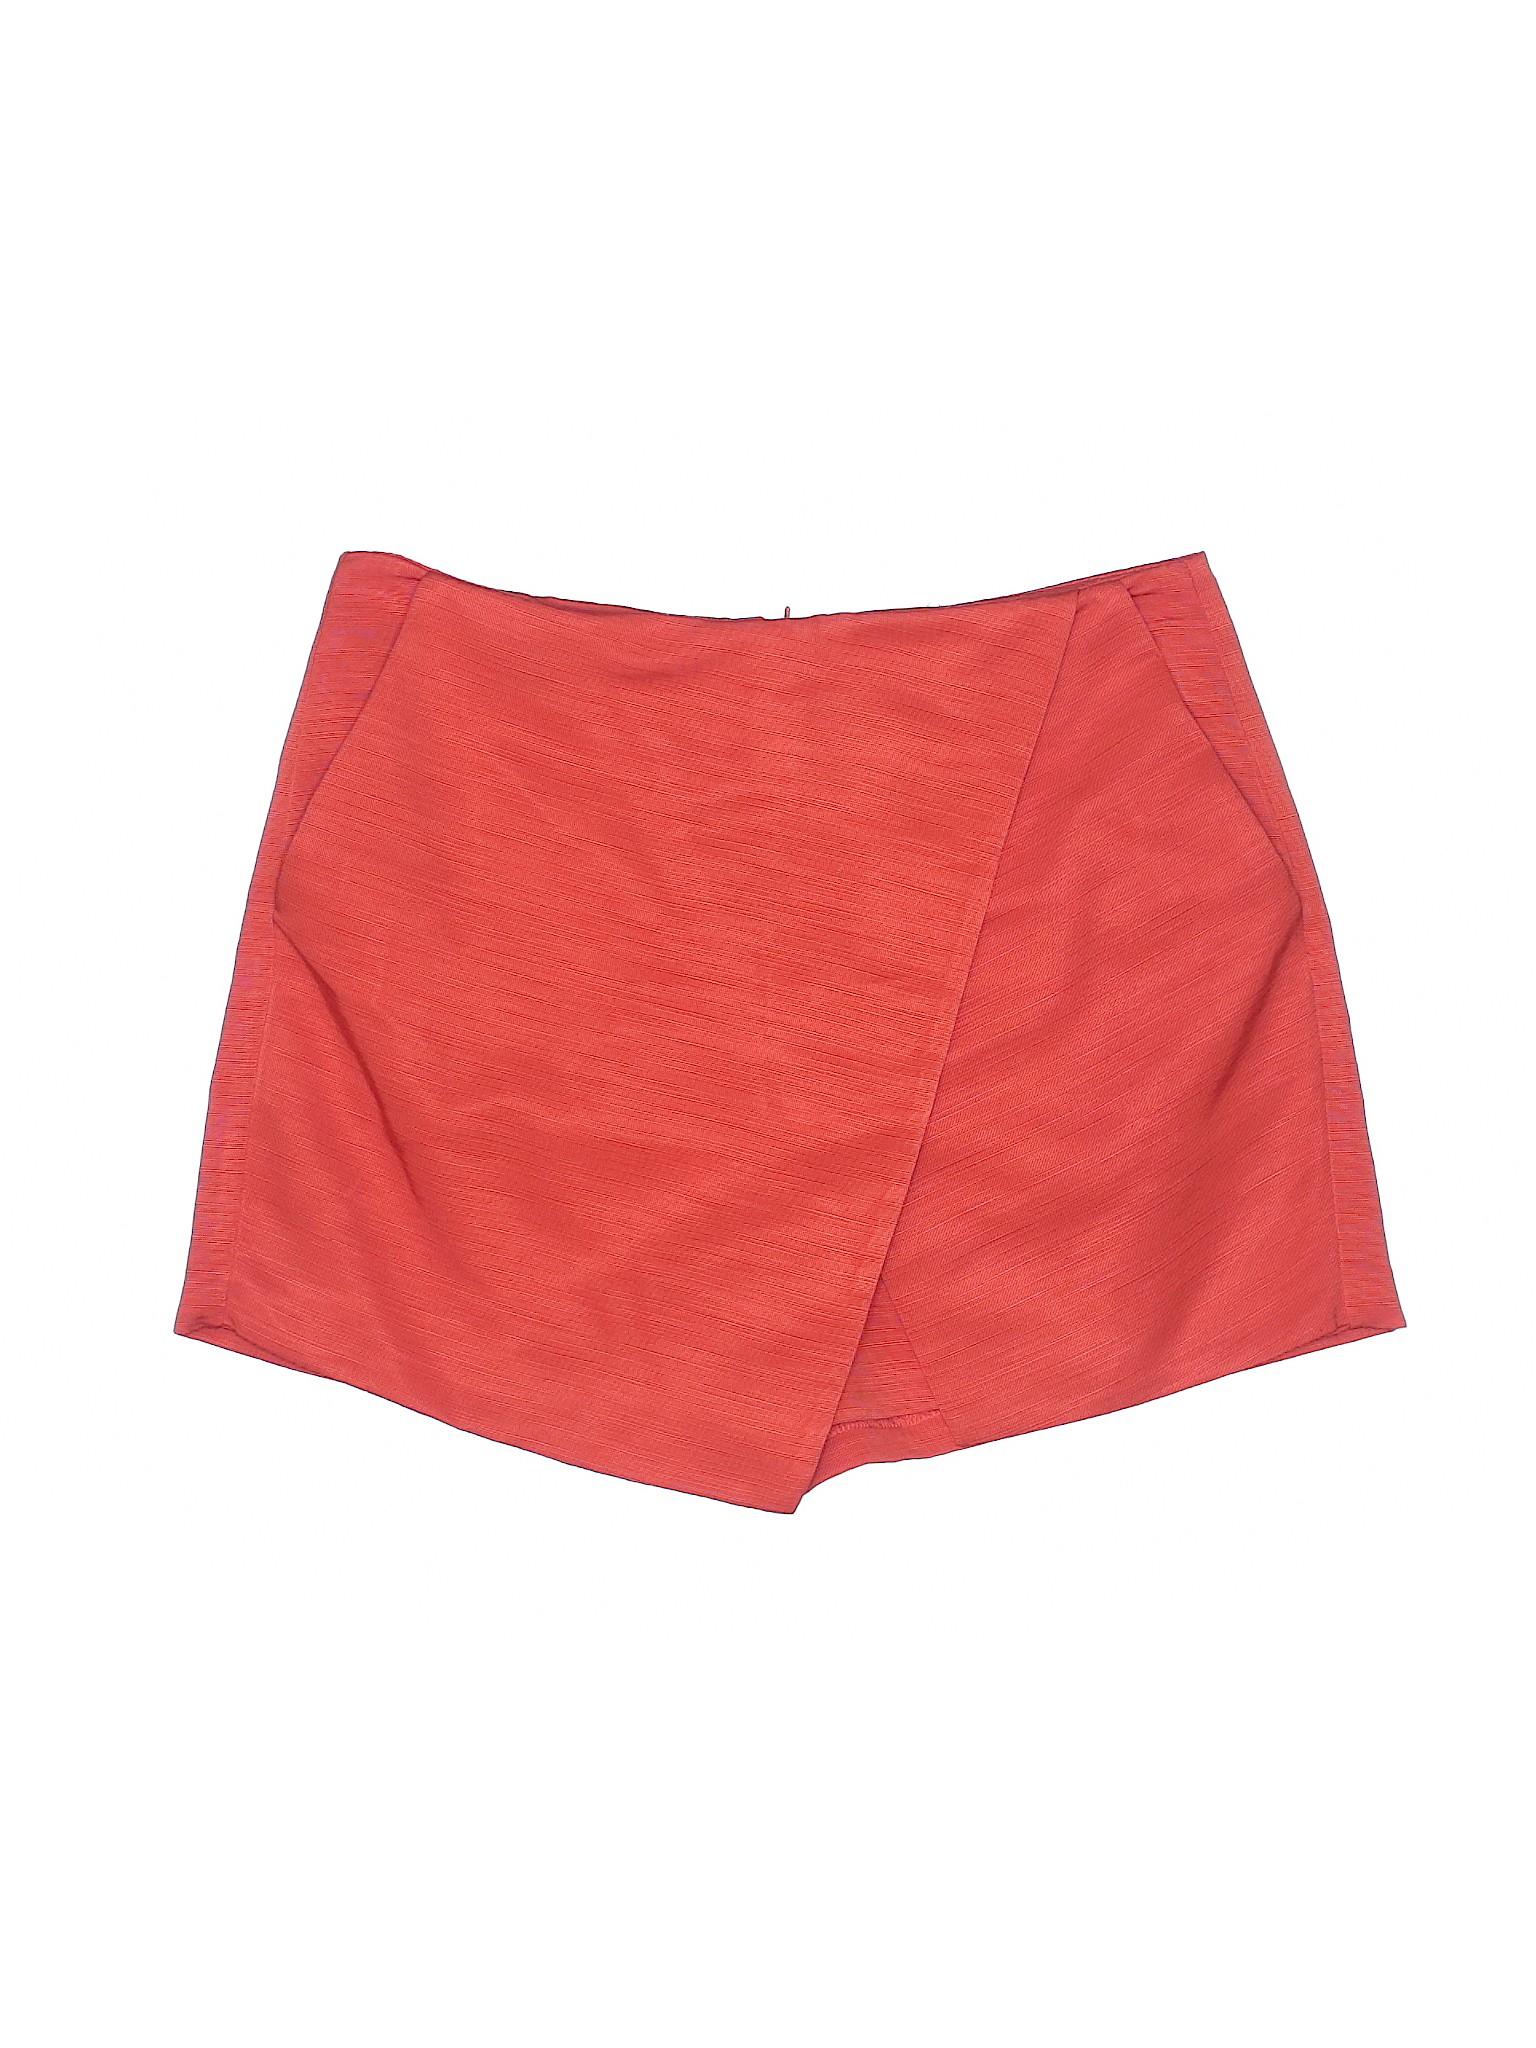 Dressy Topshop Boutique leisure leisure Boutique Shorts naqYIxUwO